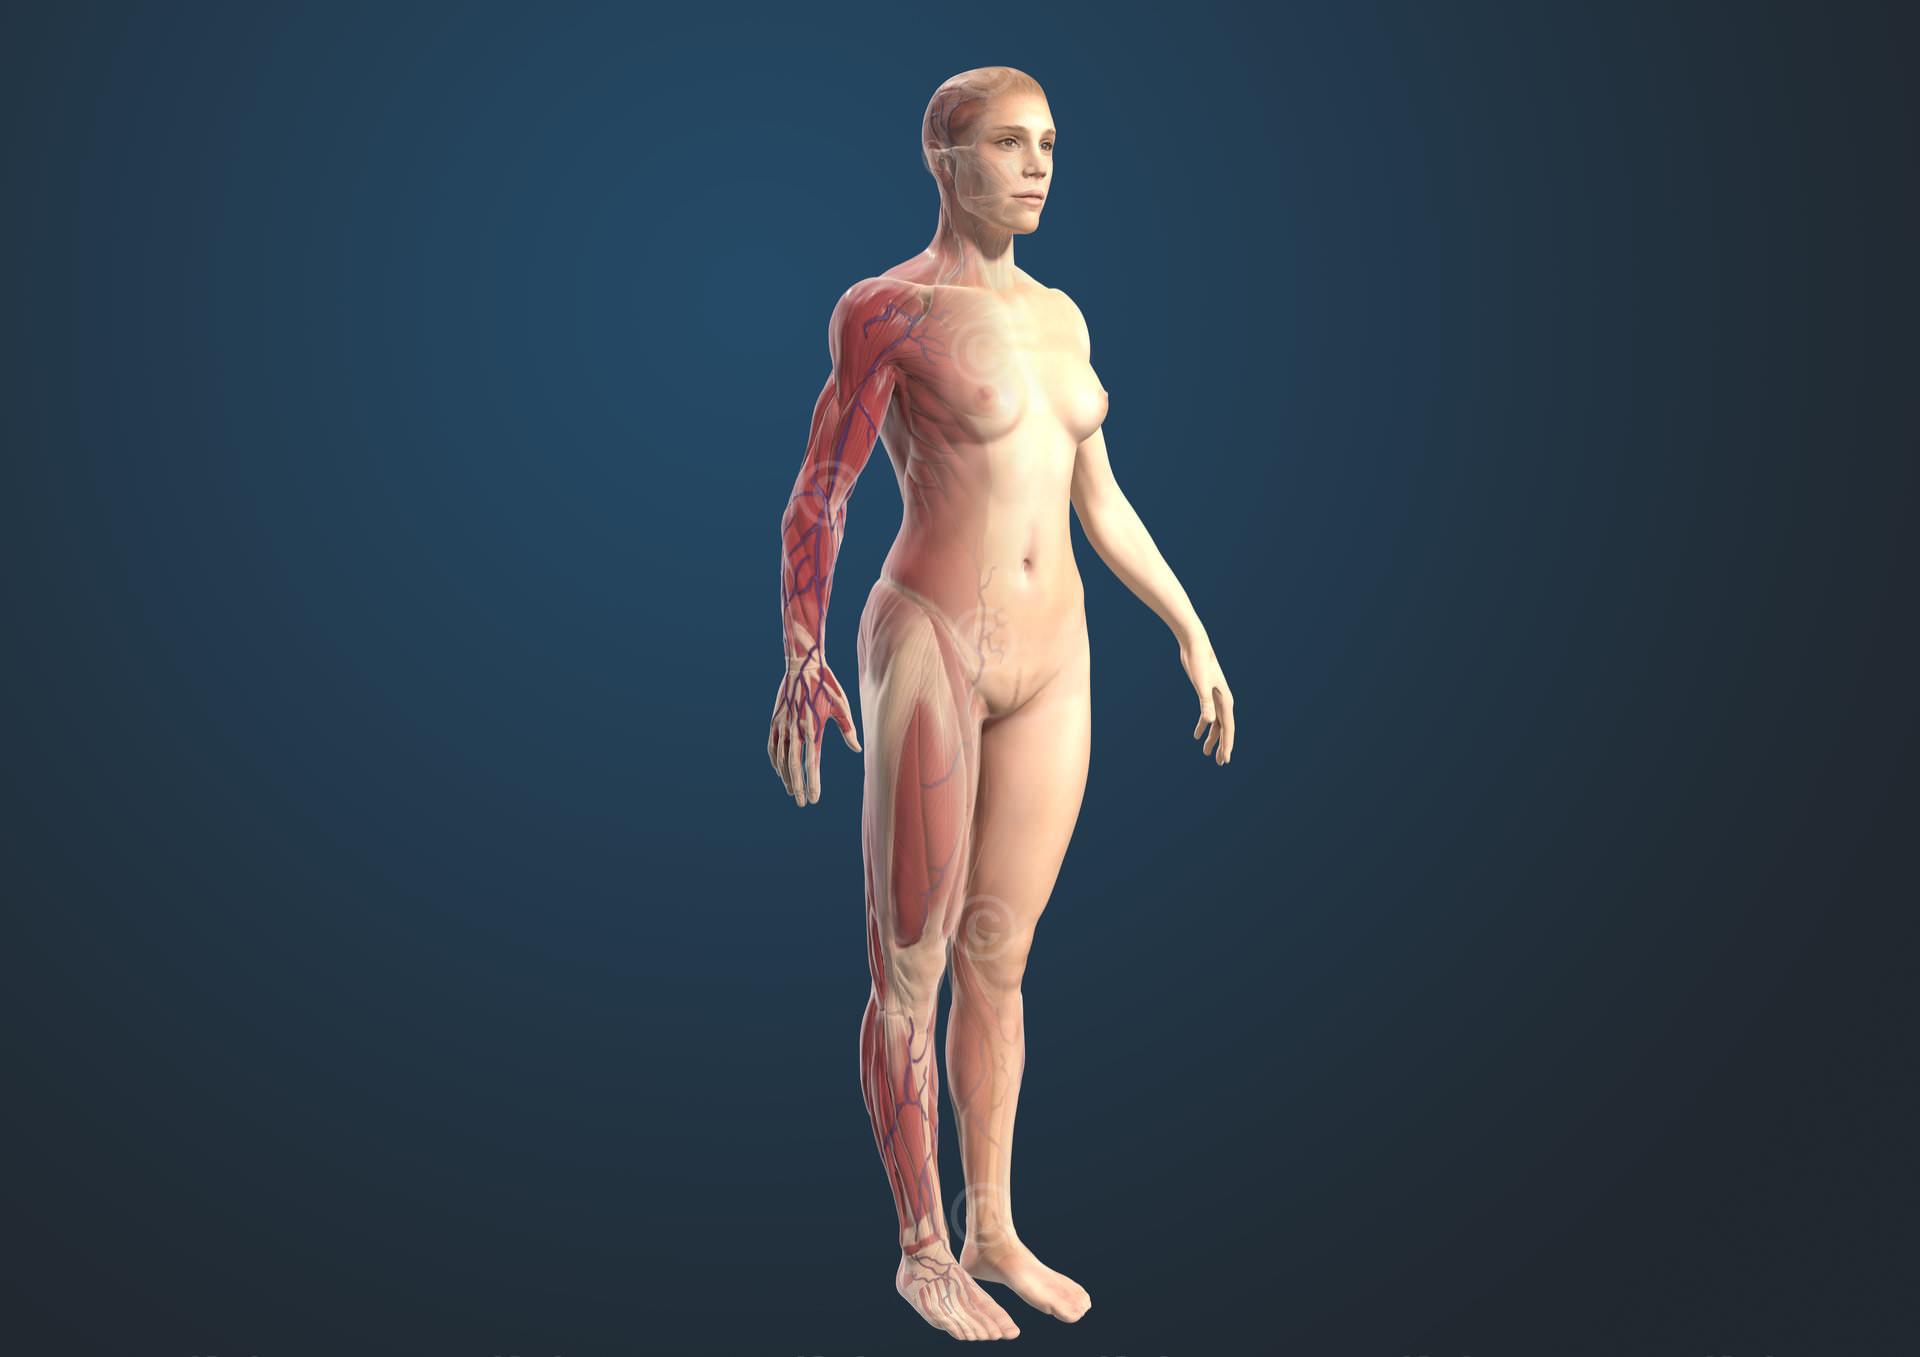 weibliche figur muskeln gross